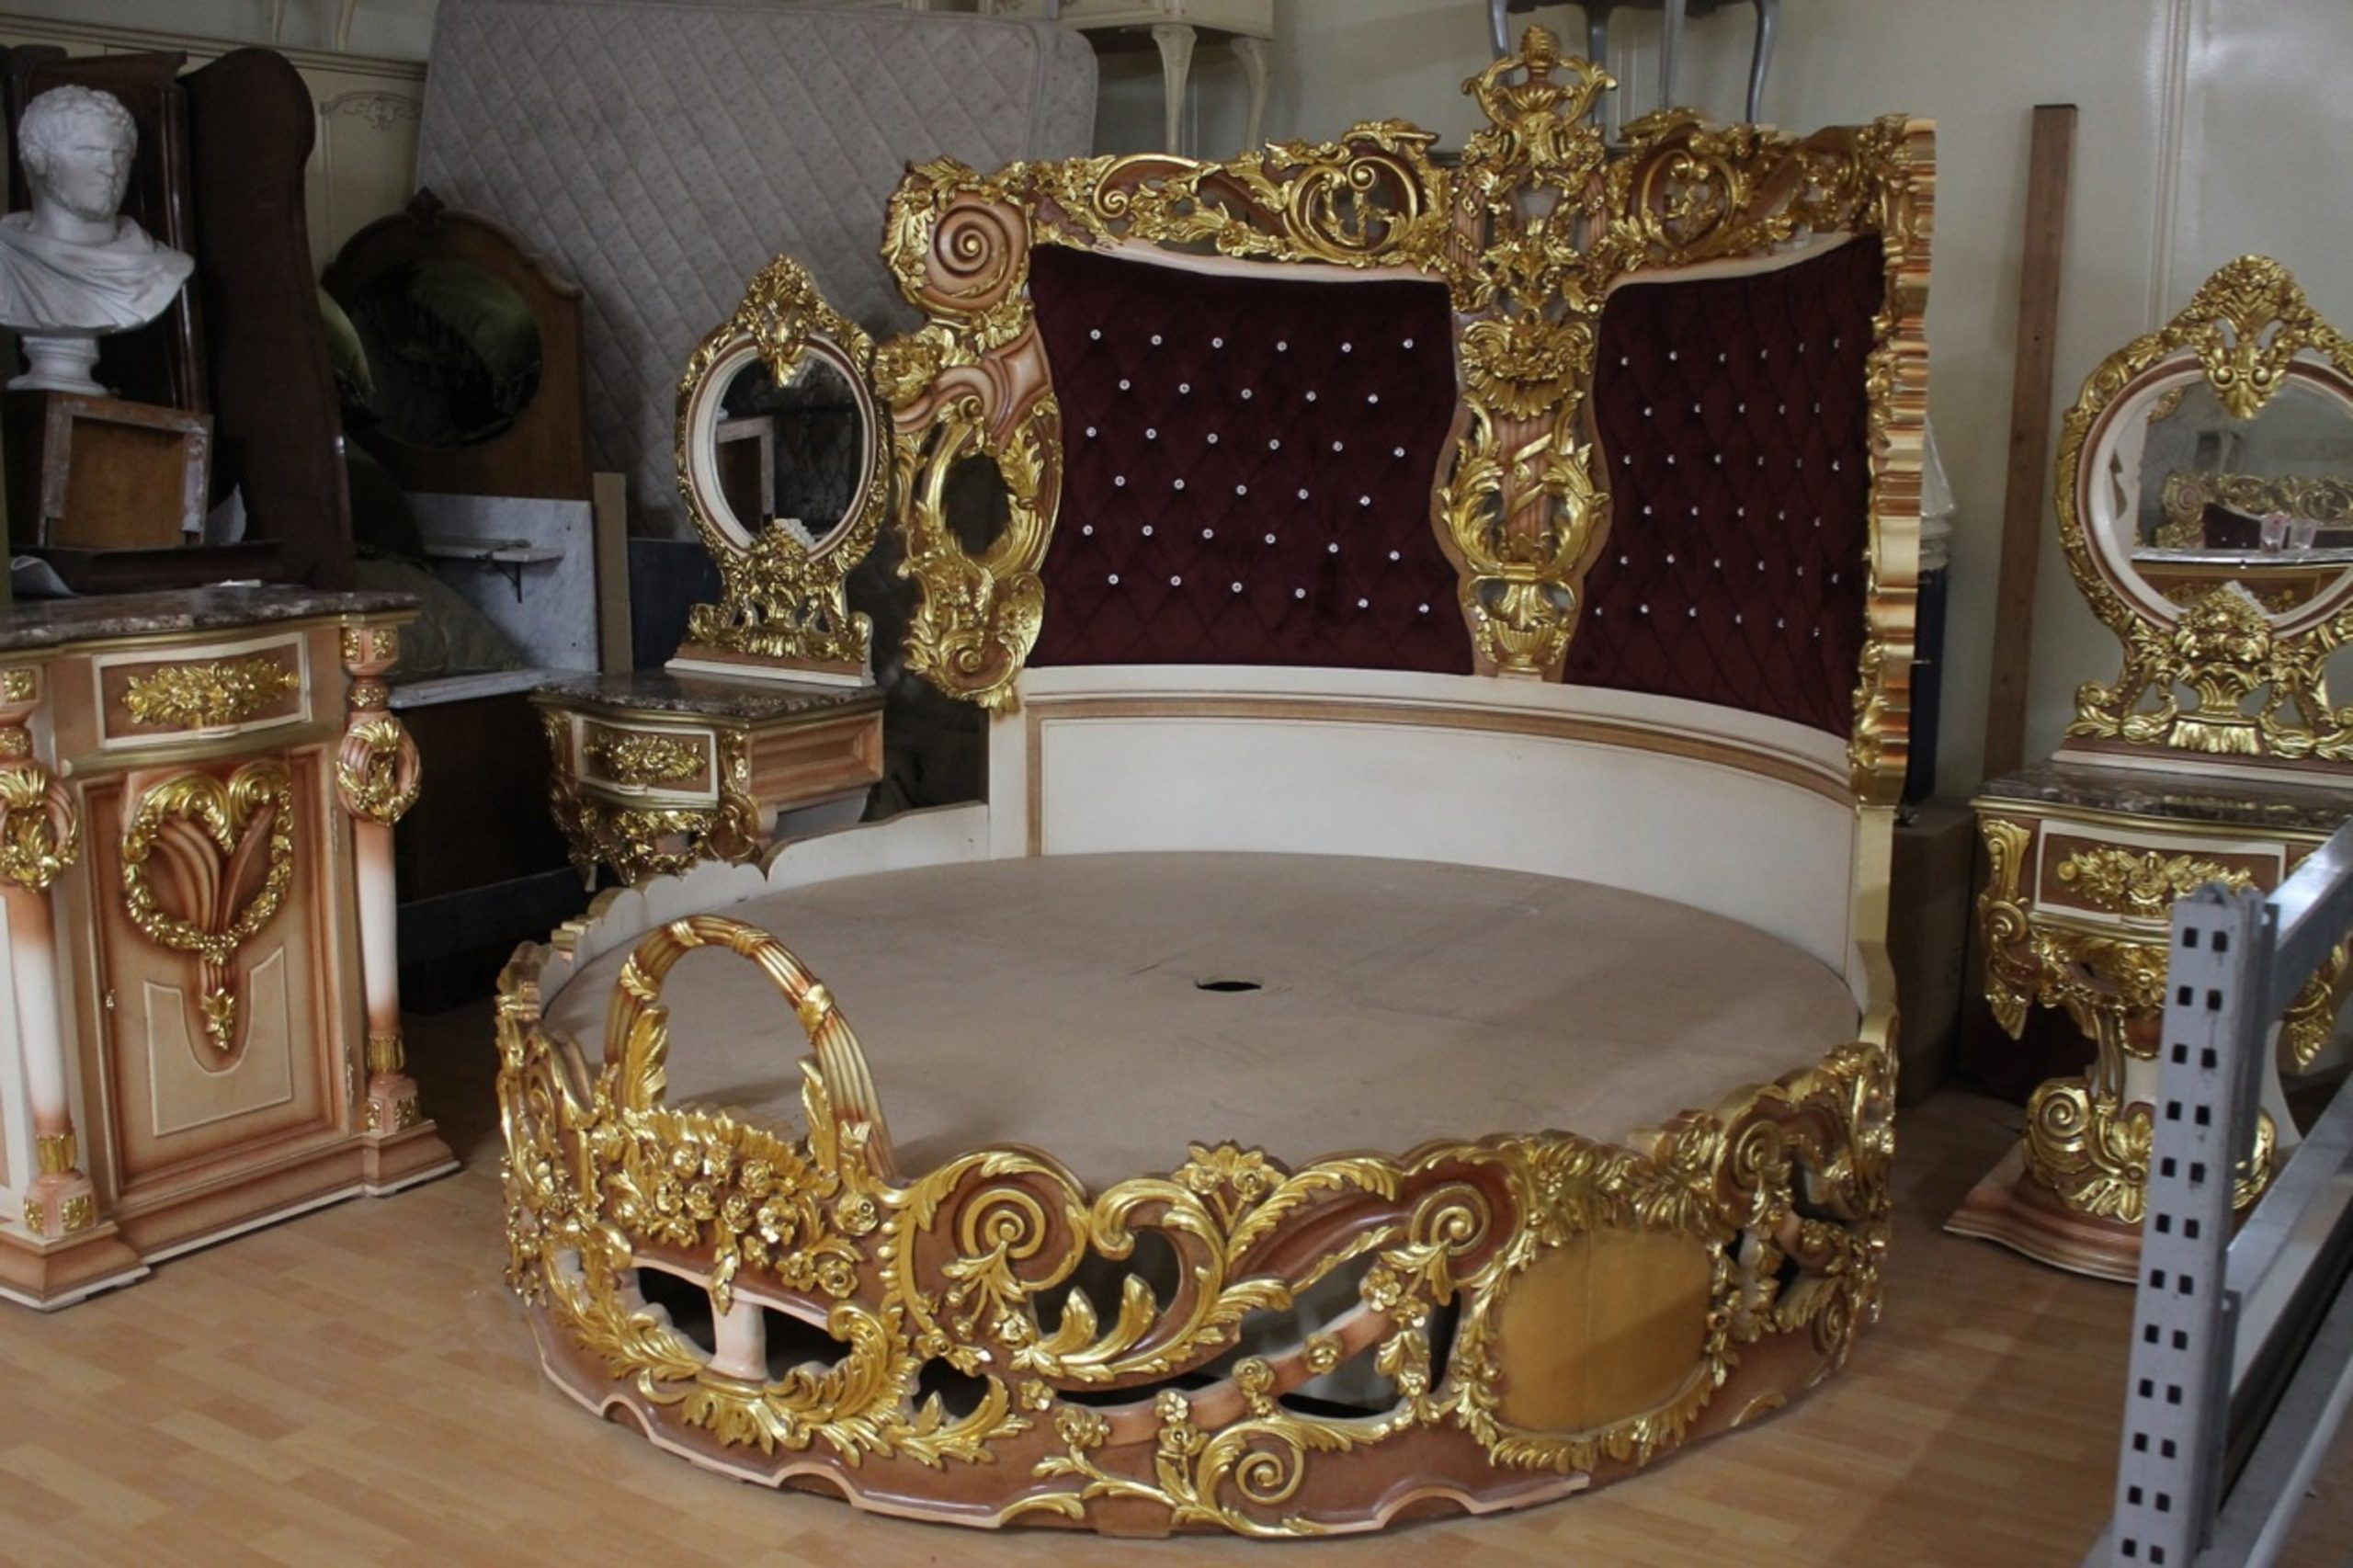 Full Size of Barock Bett Rokoko Doppelbett Rund Gold Mkbd2000 Antik Stil Dänisches Bettenlager Badezimmer Mit Rückenlehne Paradies Betten Ausklappbar Aufbewahrung 180x200 Bett Barock Bett